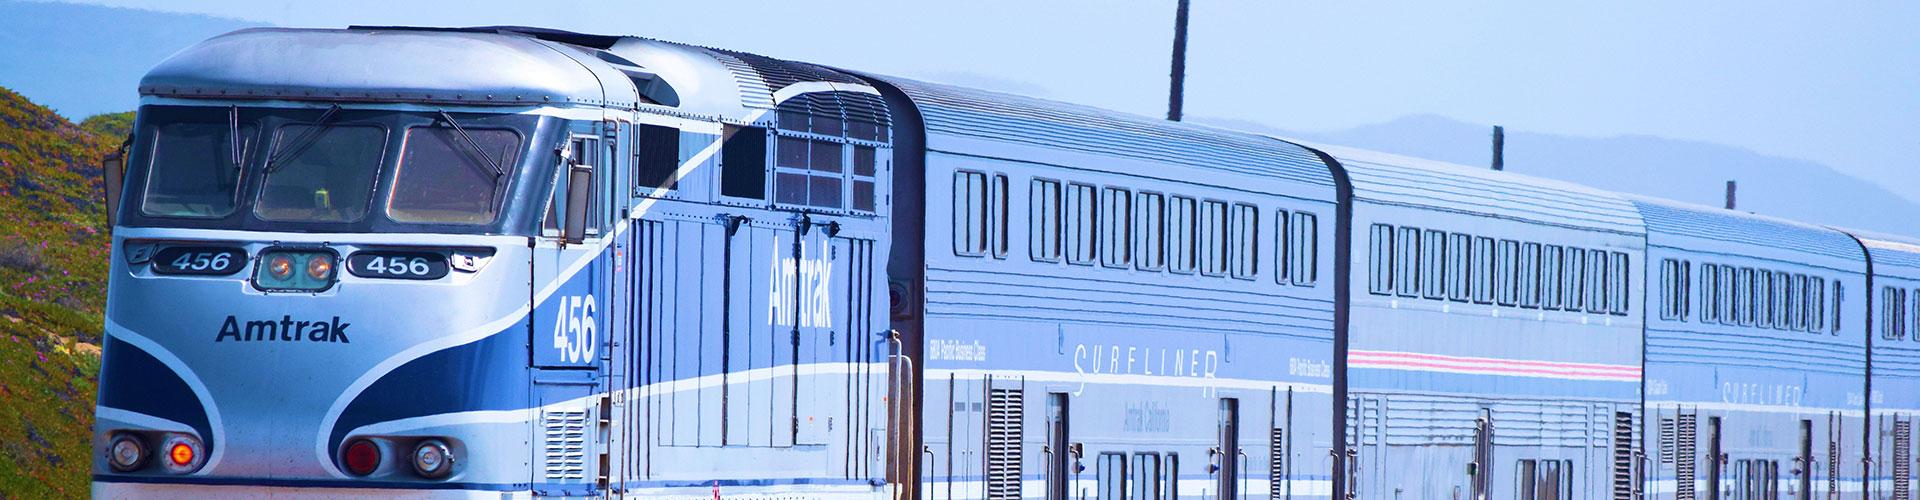 Nash County Transportation